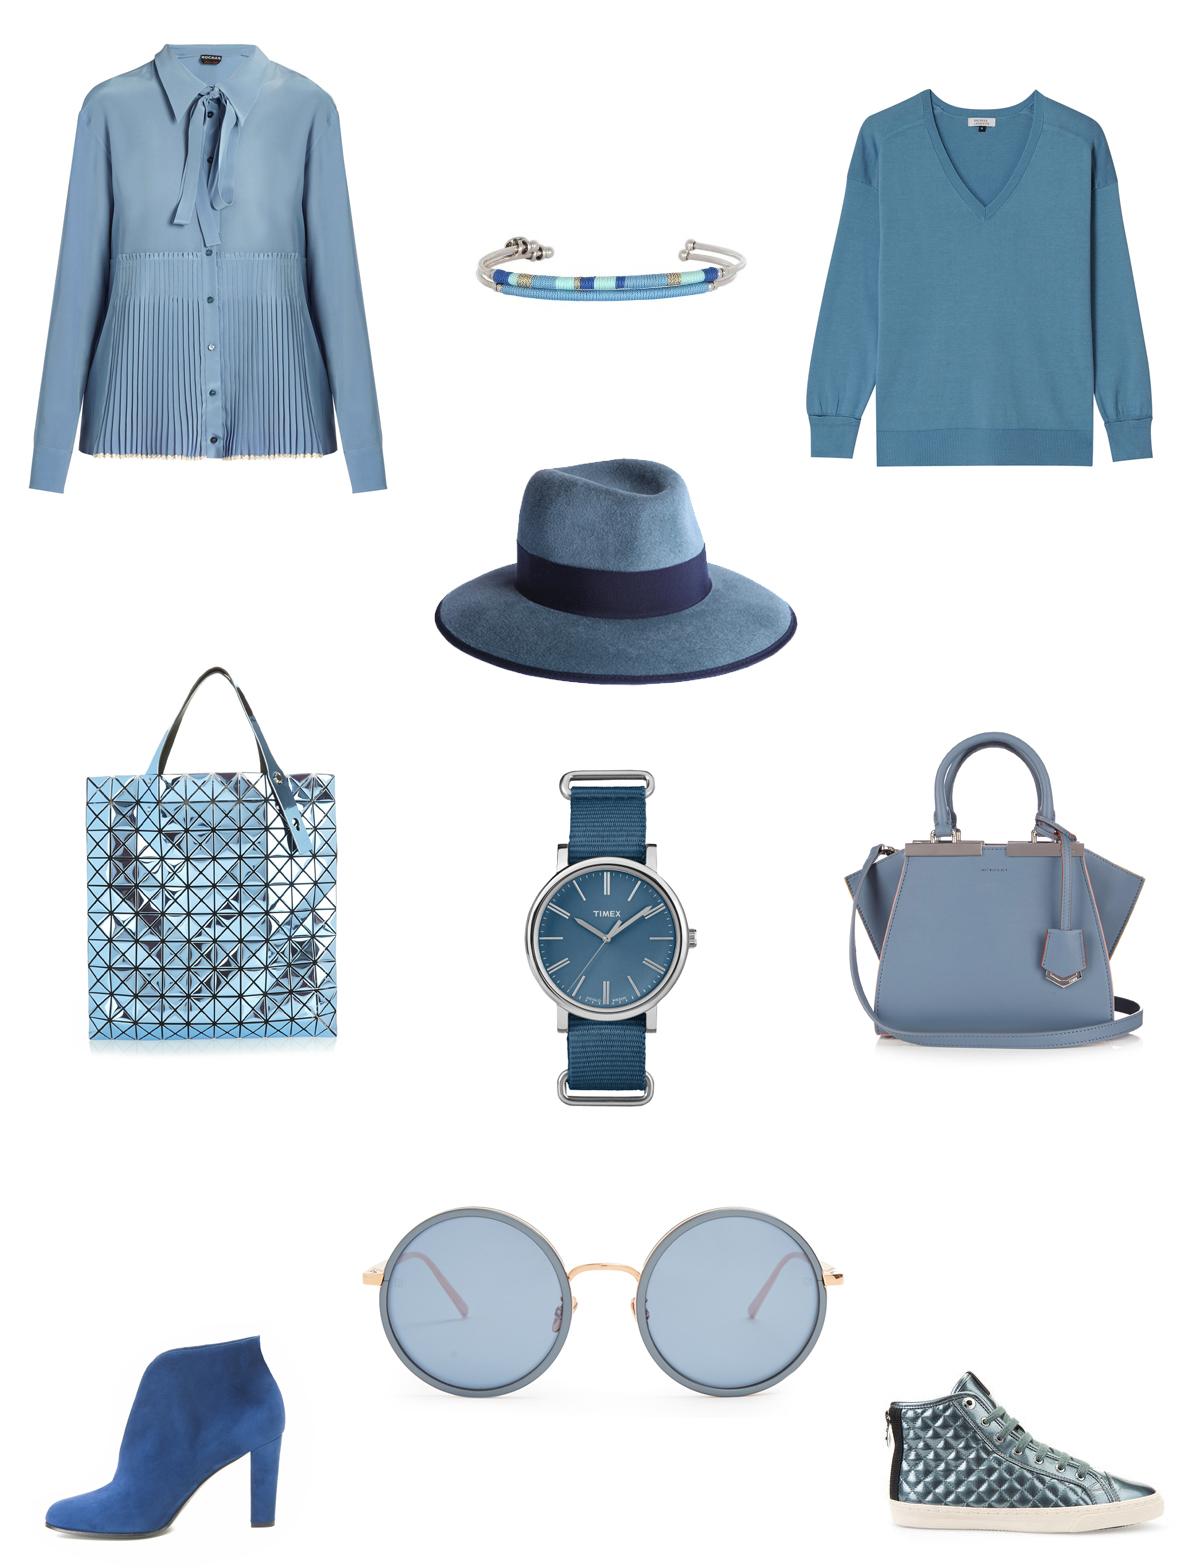 bleu_ciel-fashion-selection-justemagazine